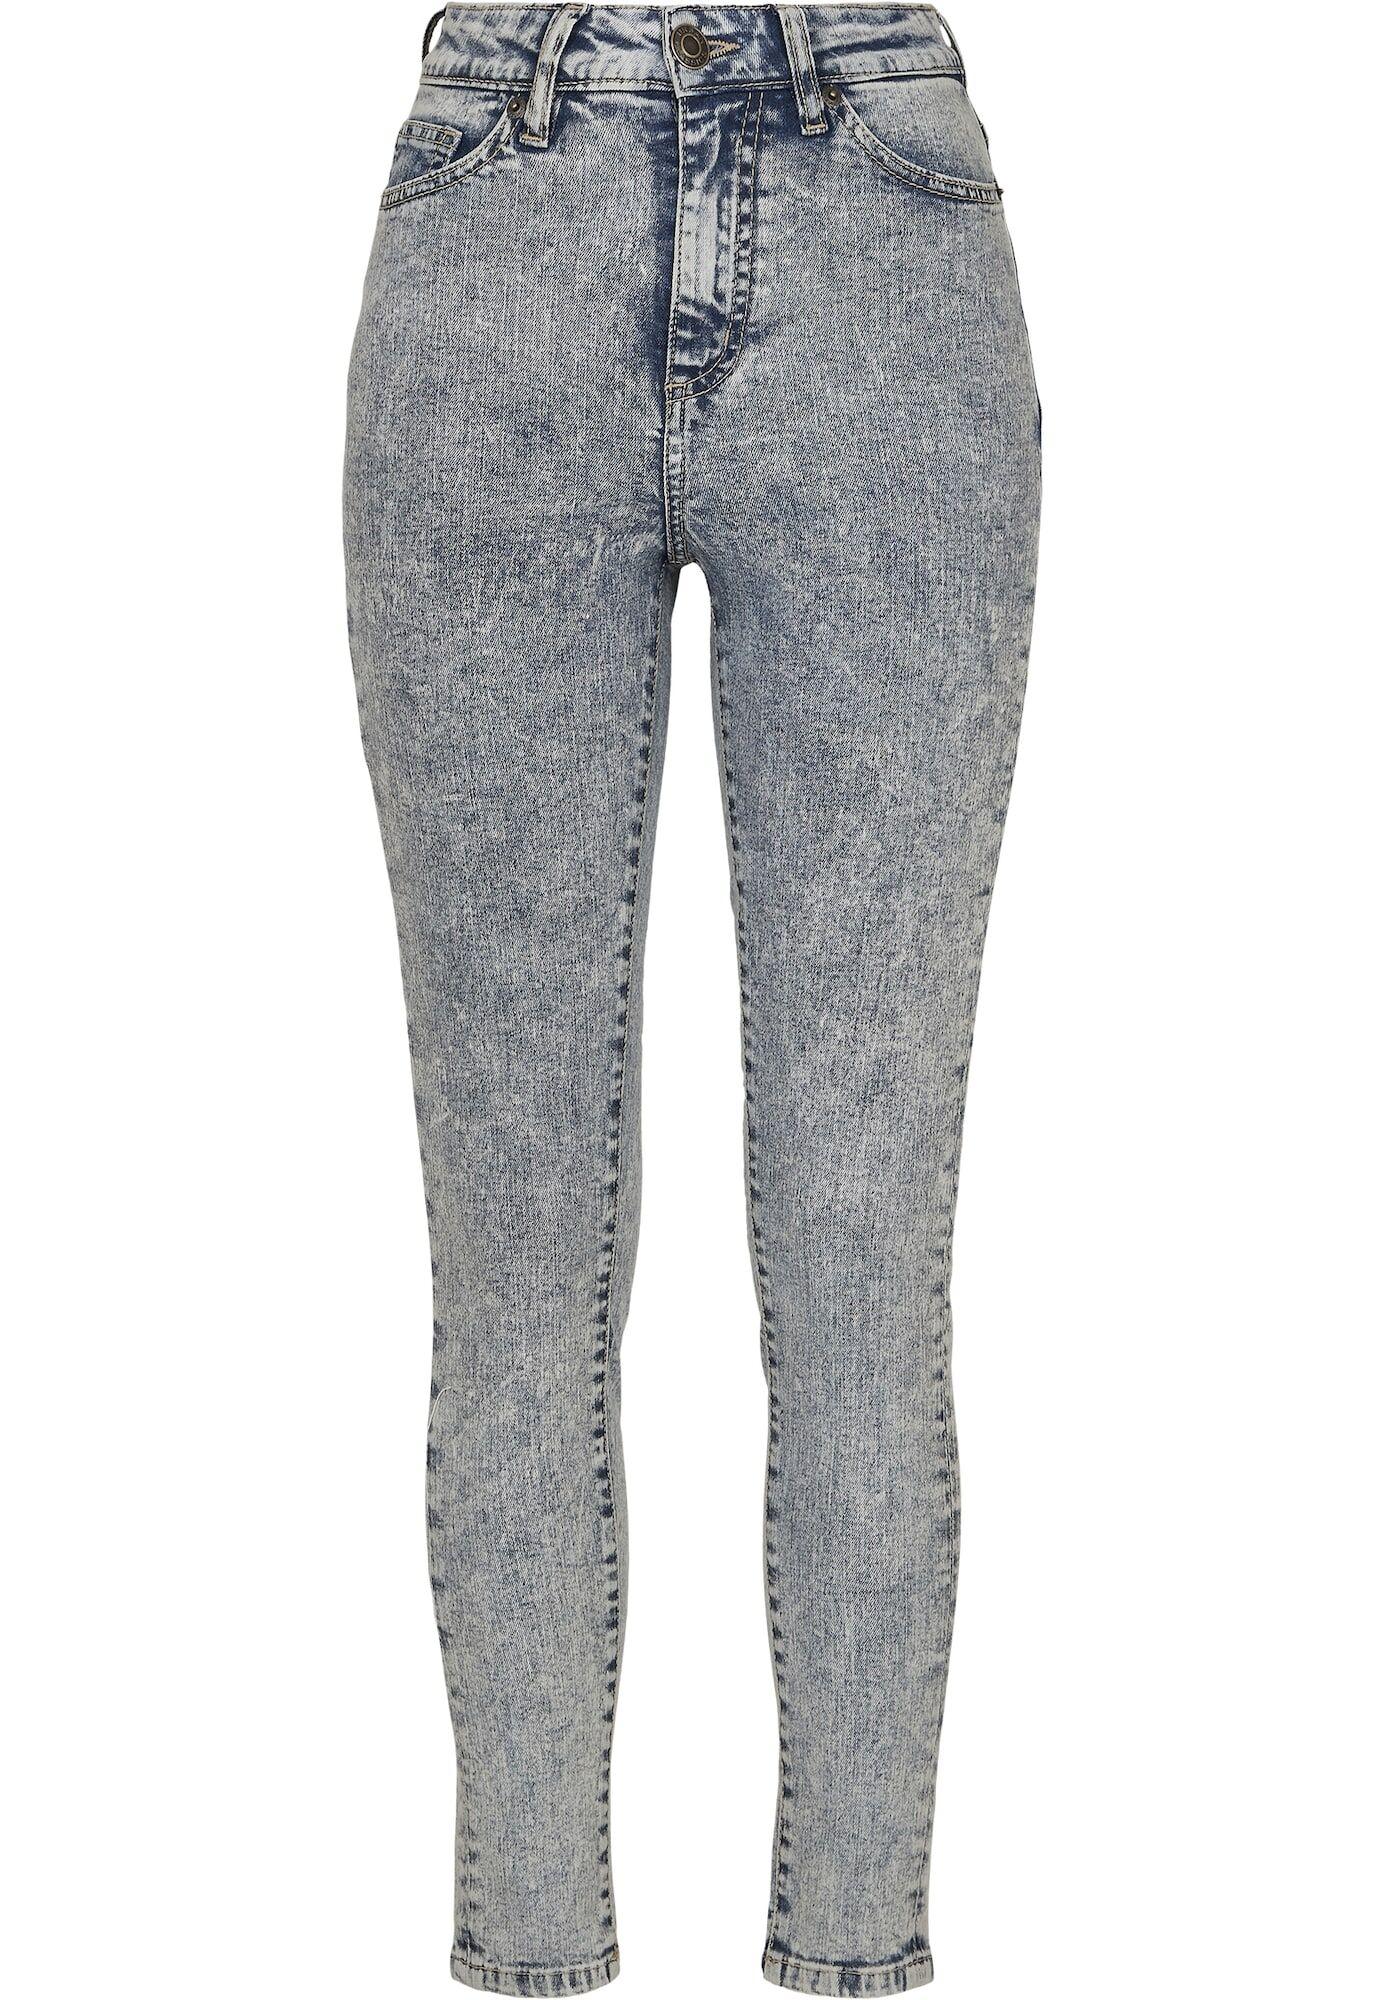 Urban Classics Jean  - Bleu - Taille: 30 - female